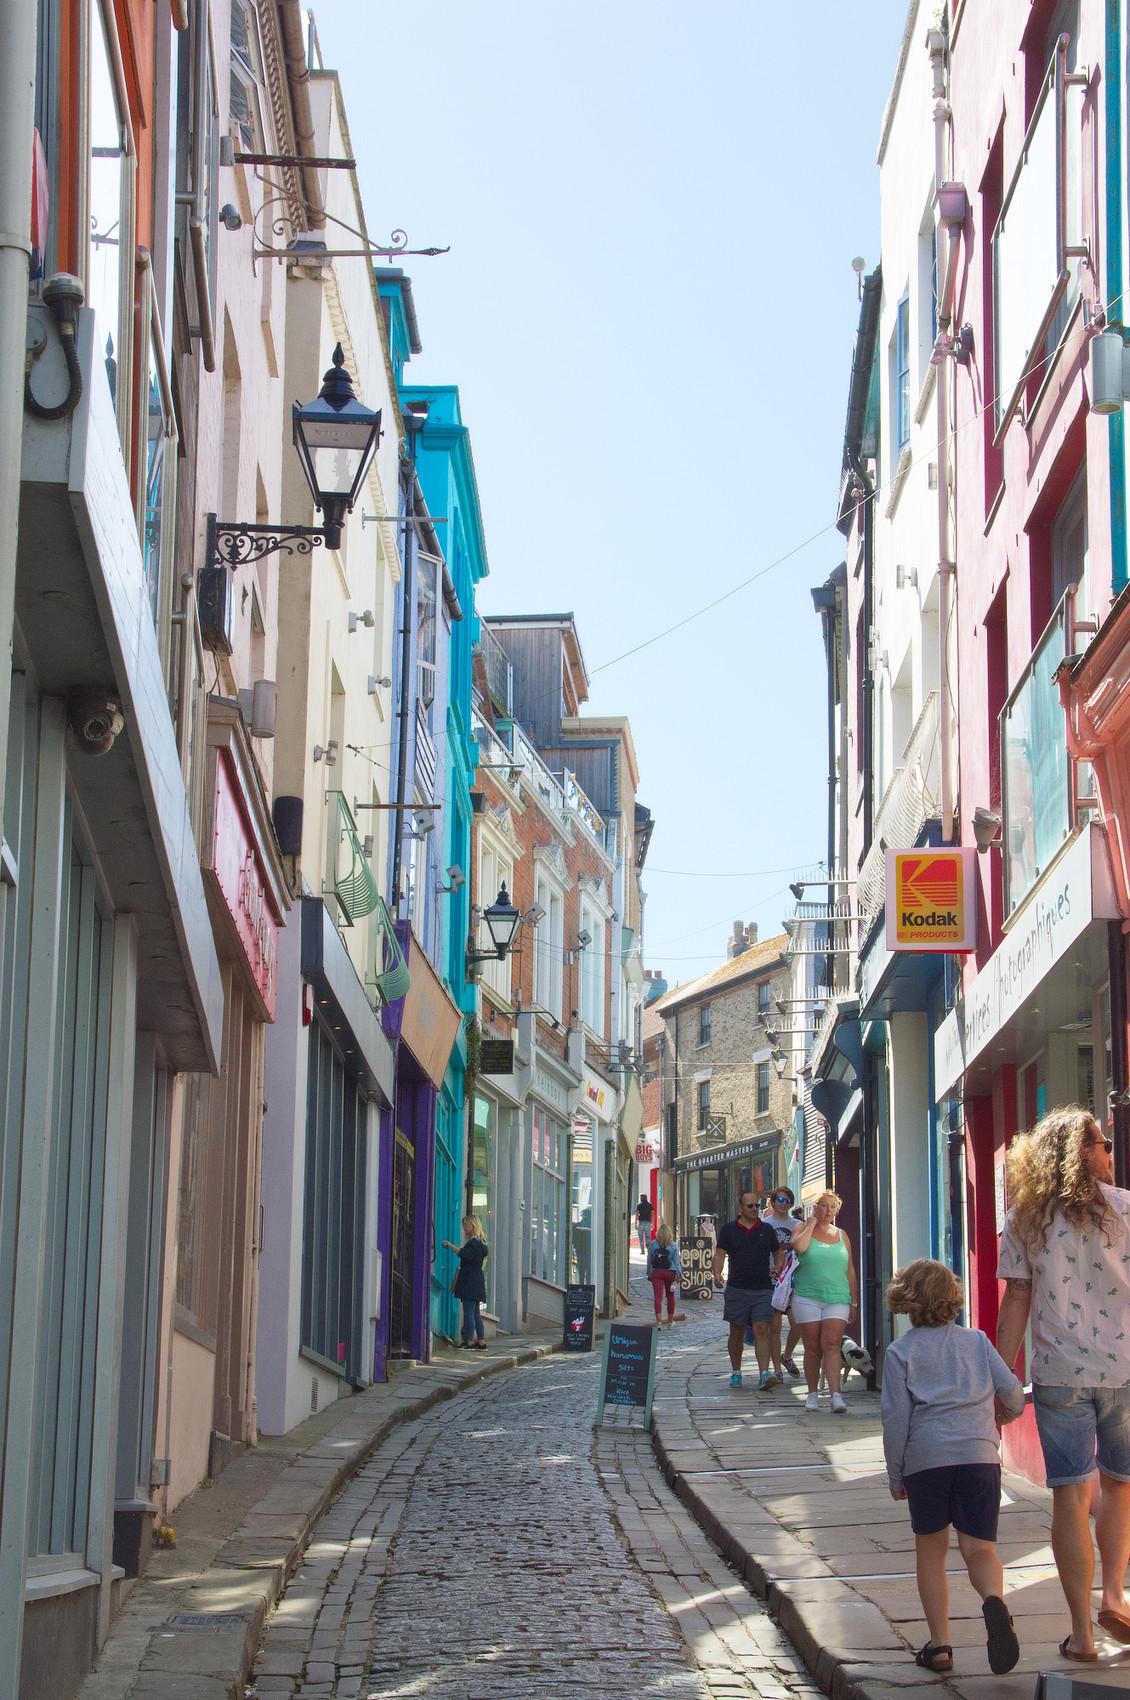 The Old High Street, Folkestone